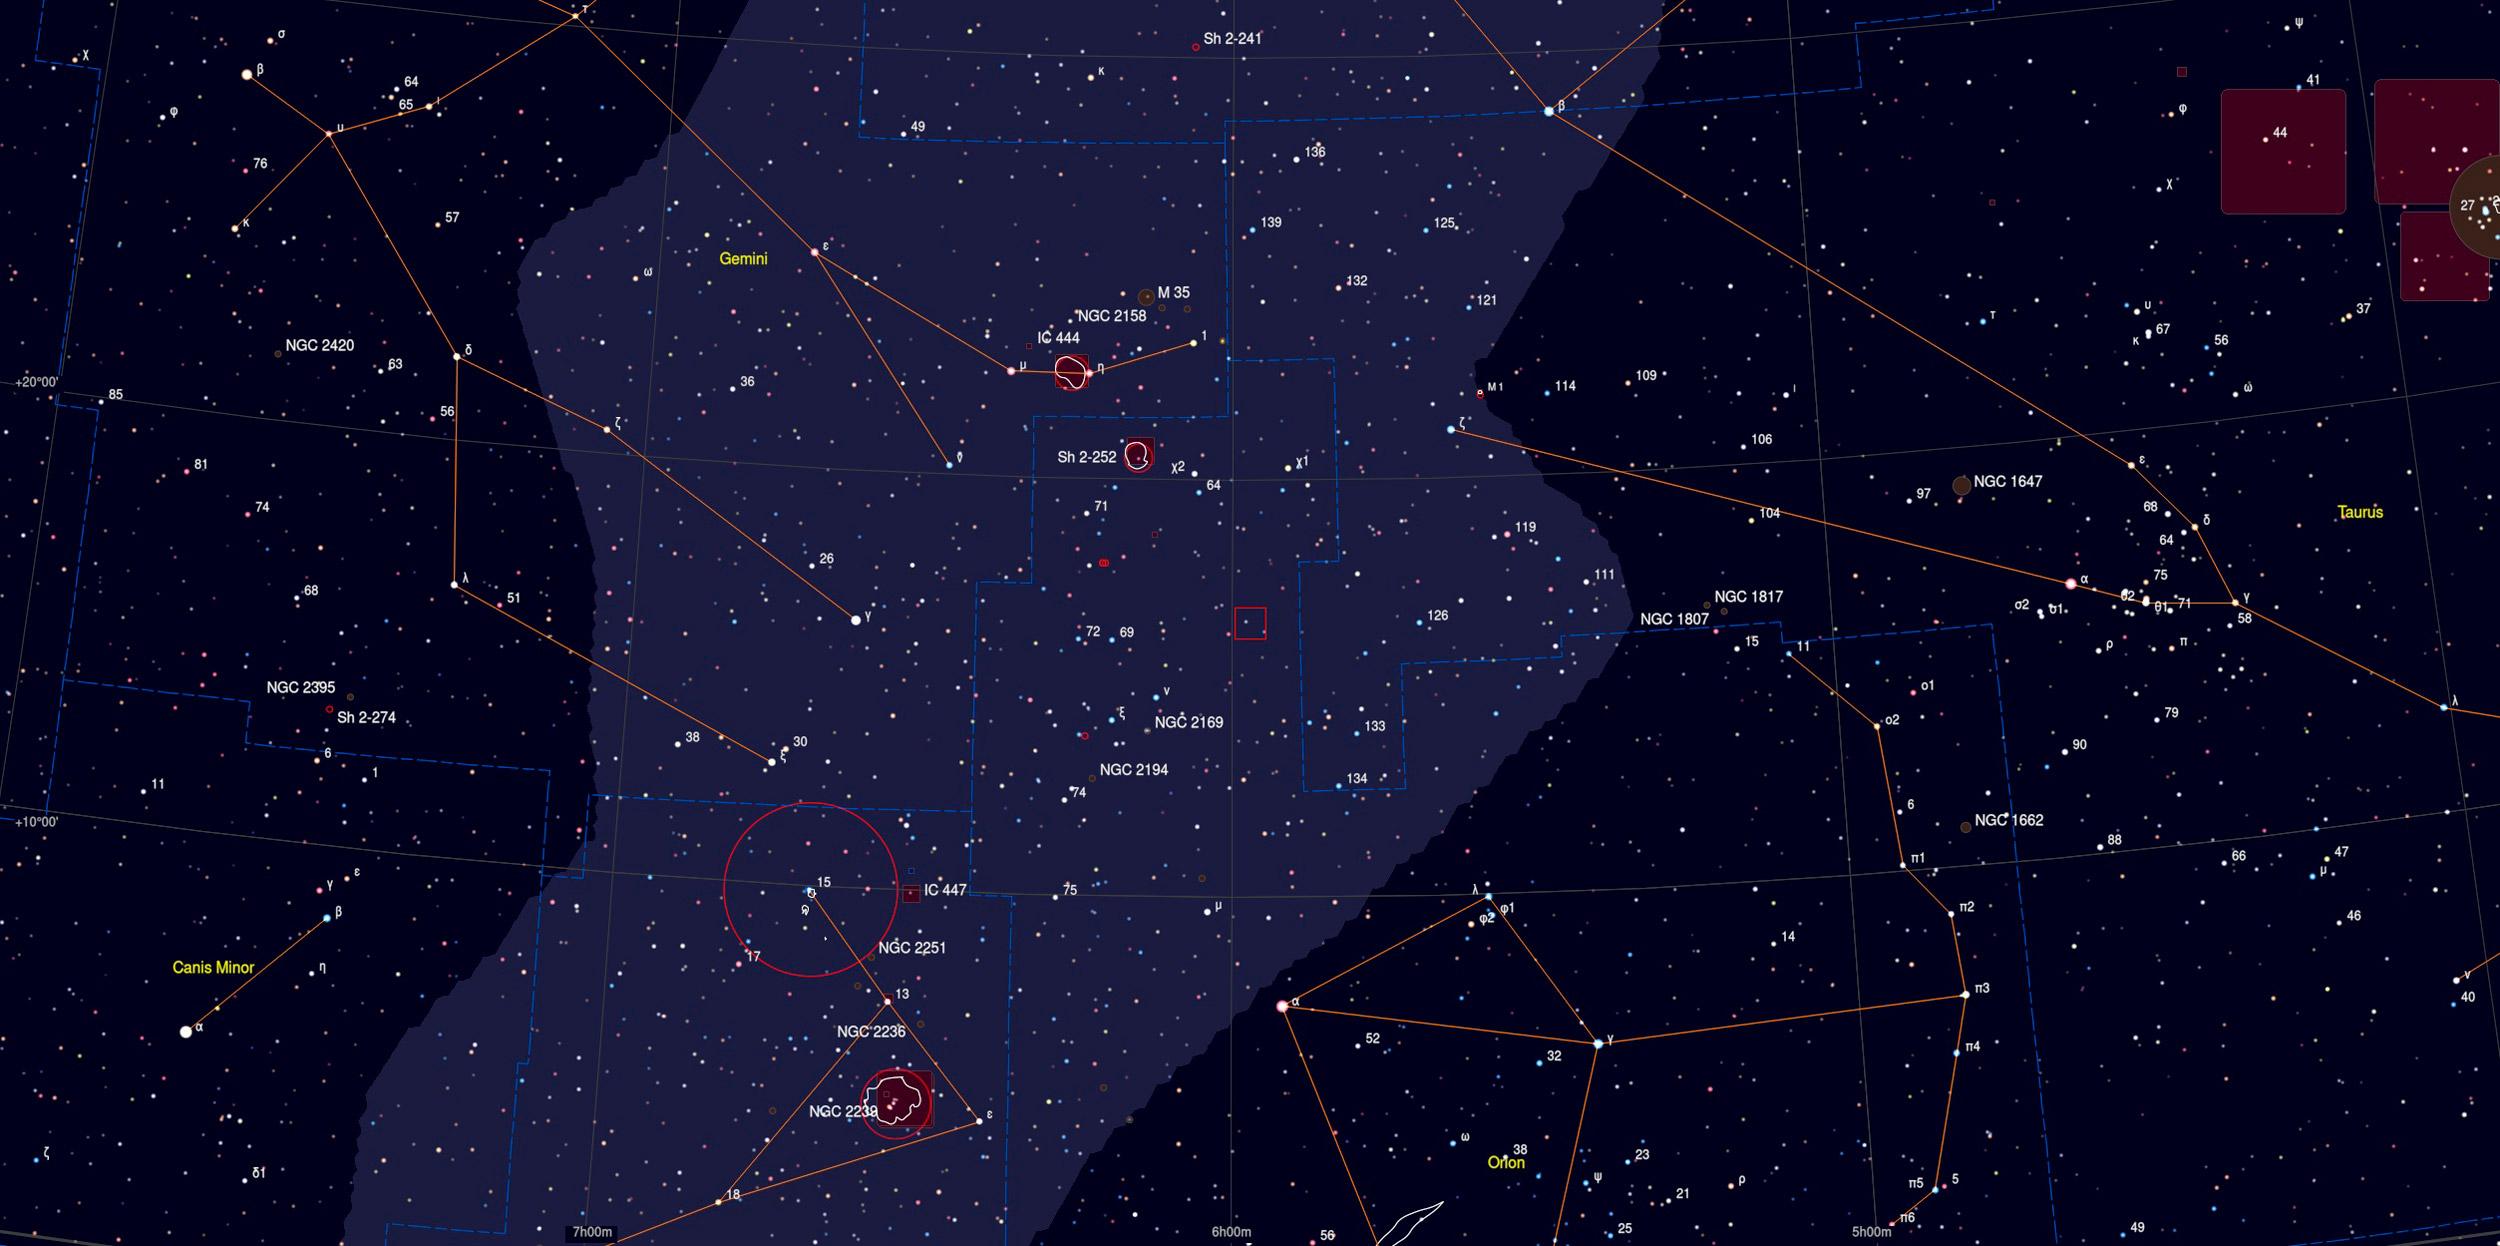 AFGL 5173 Nebula Sky Chart - Astrophotography Martin Rusterholz